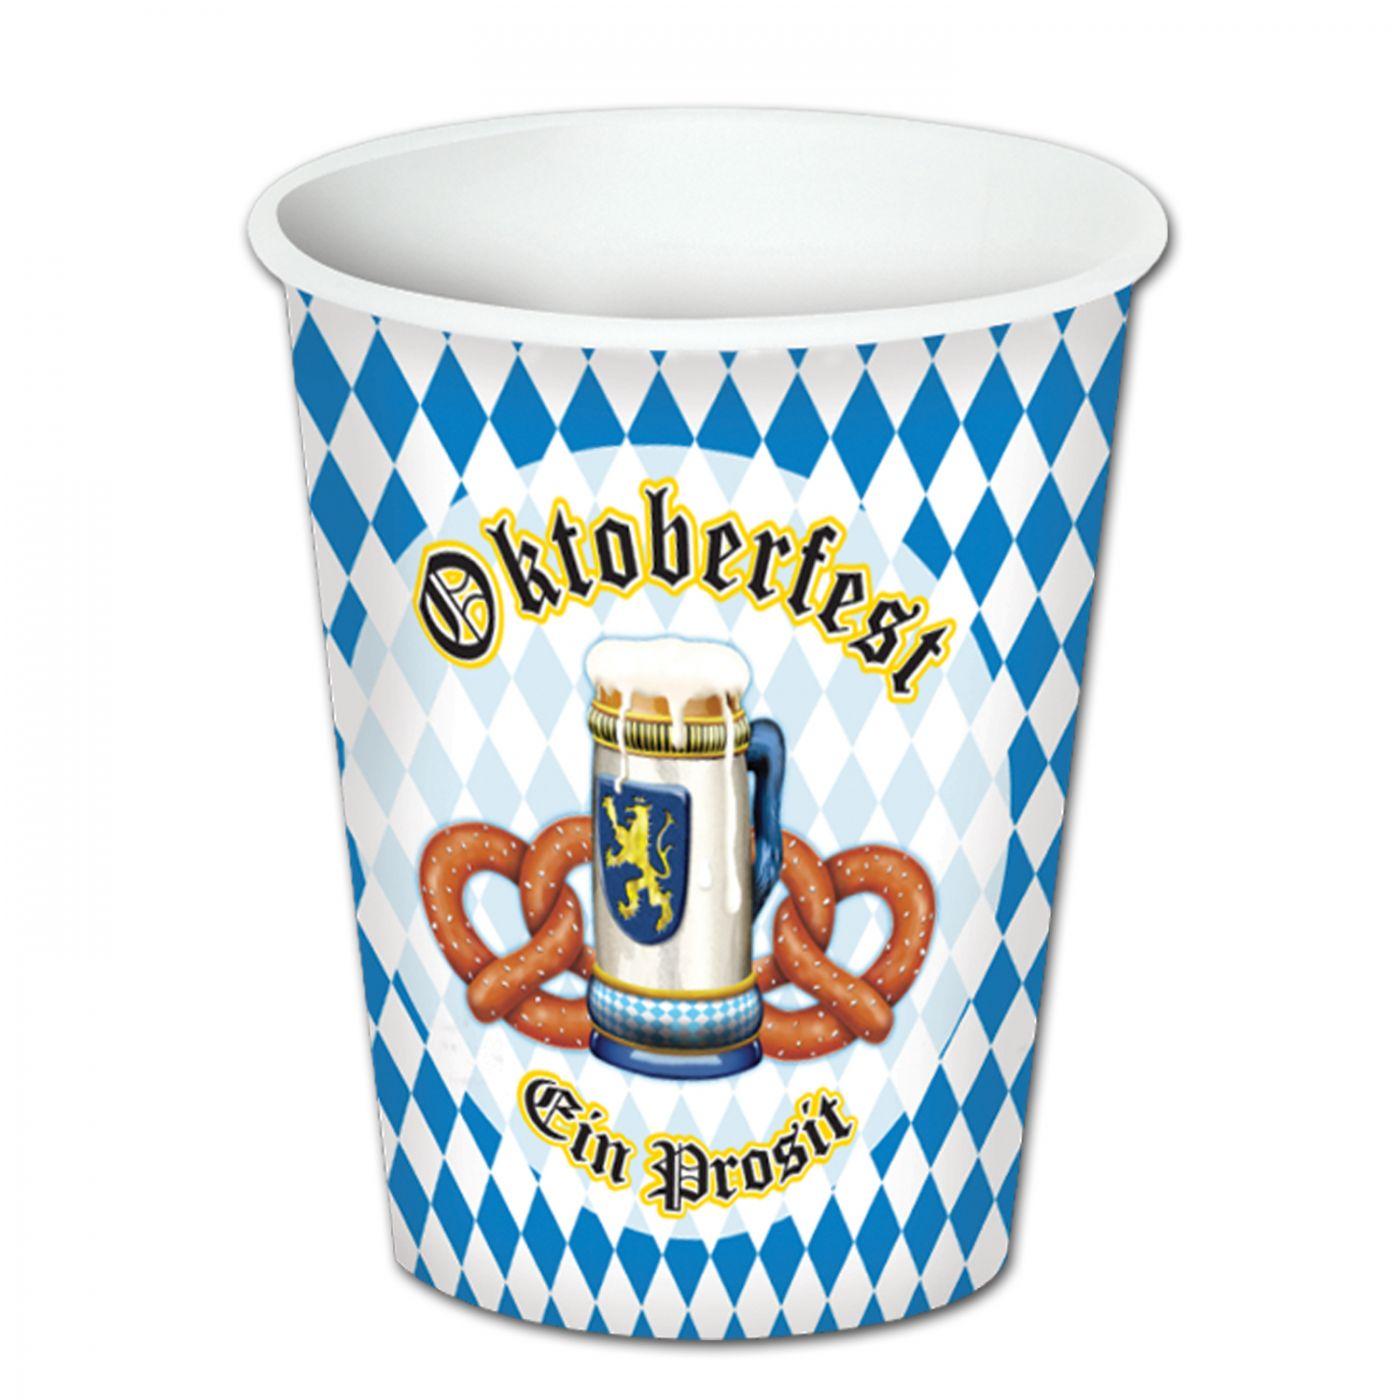 Oktoberfest Beverage Cups image